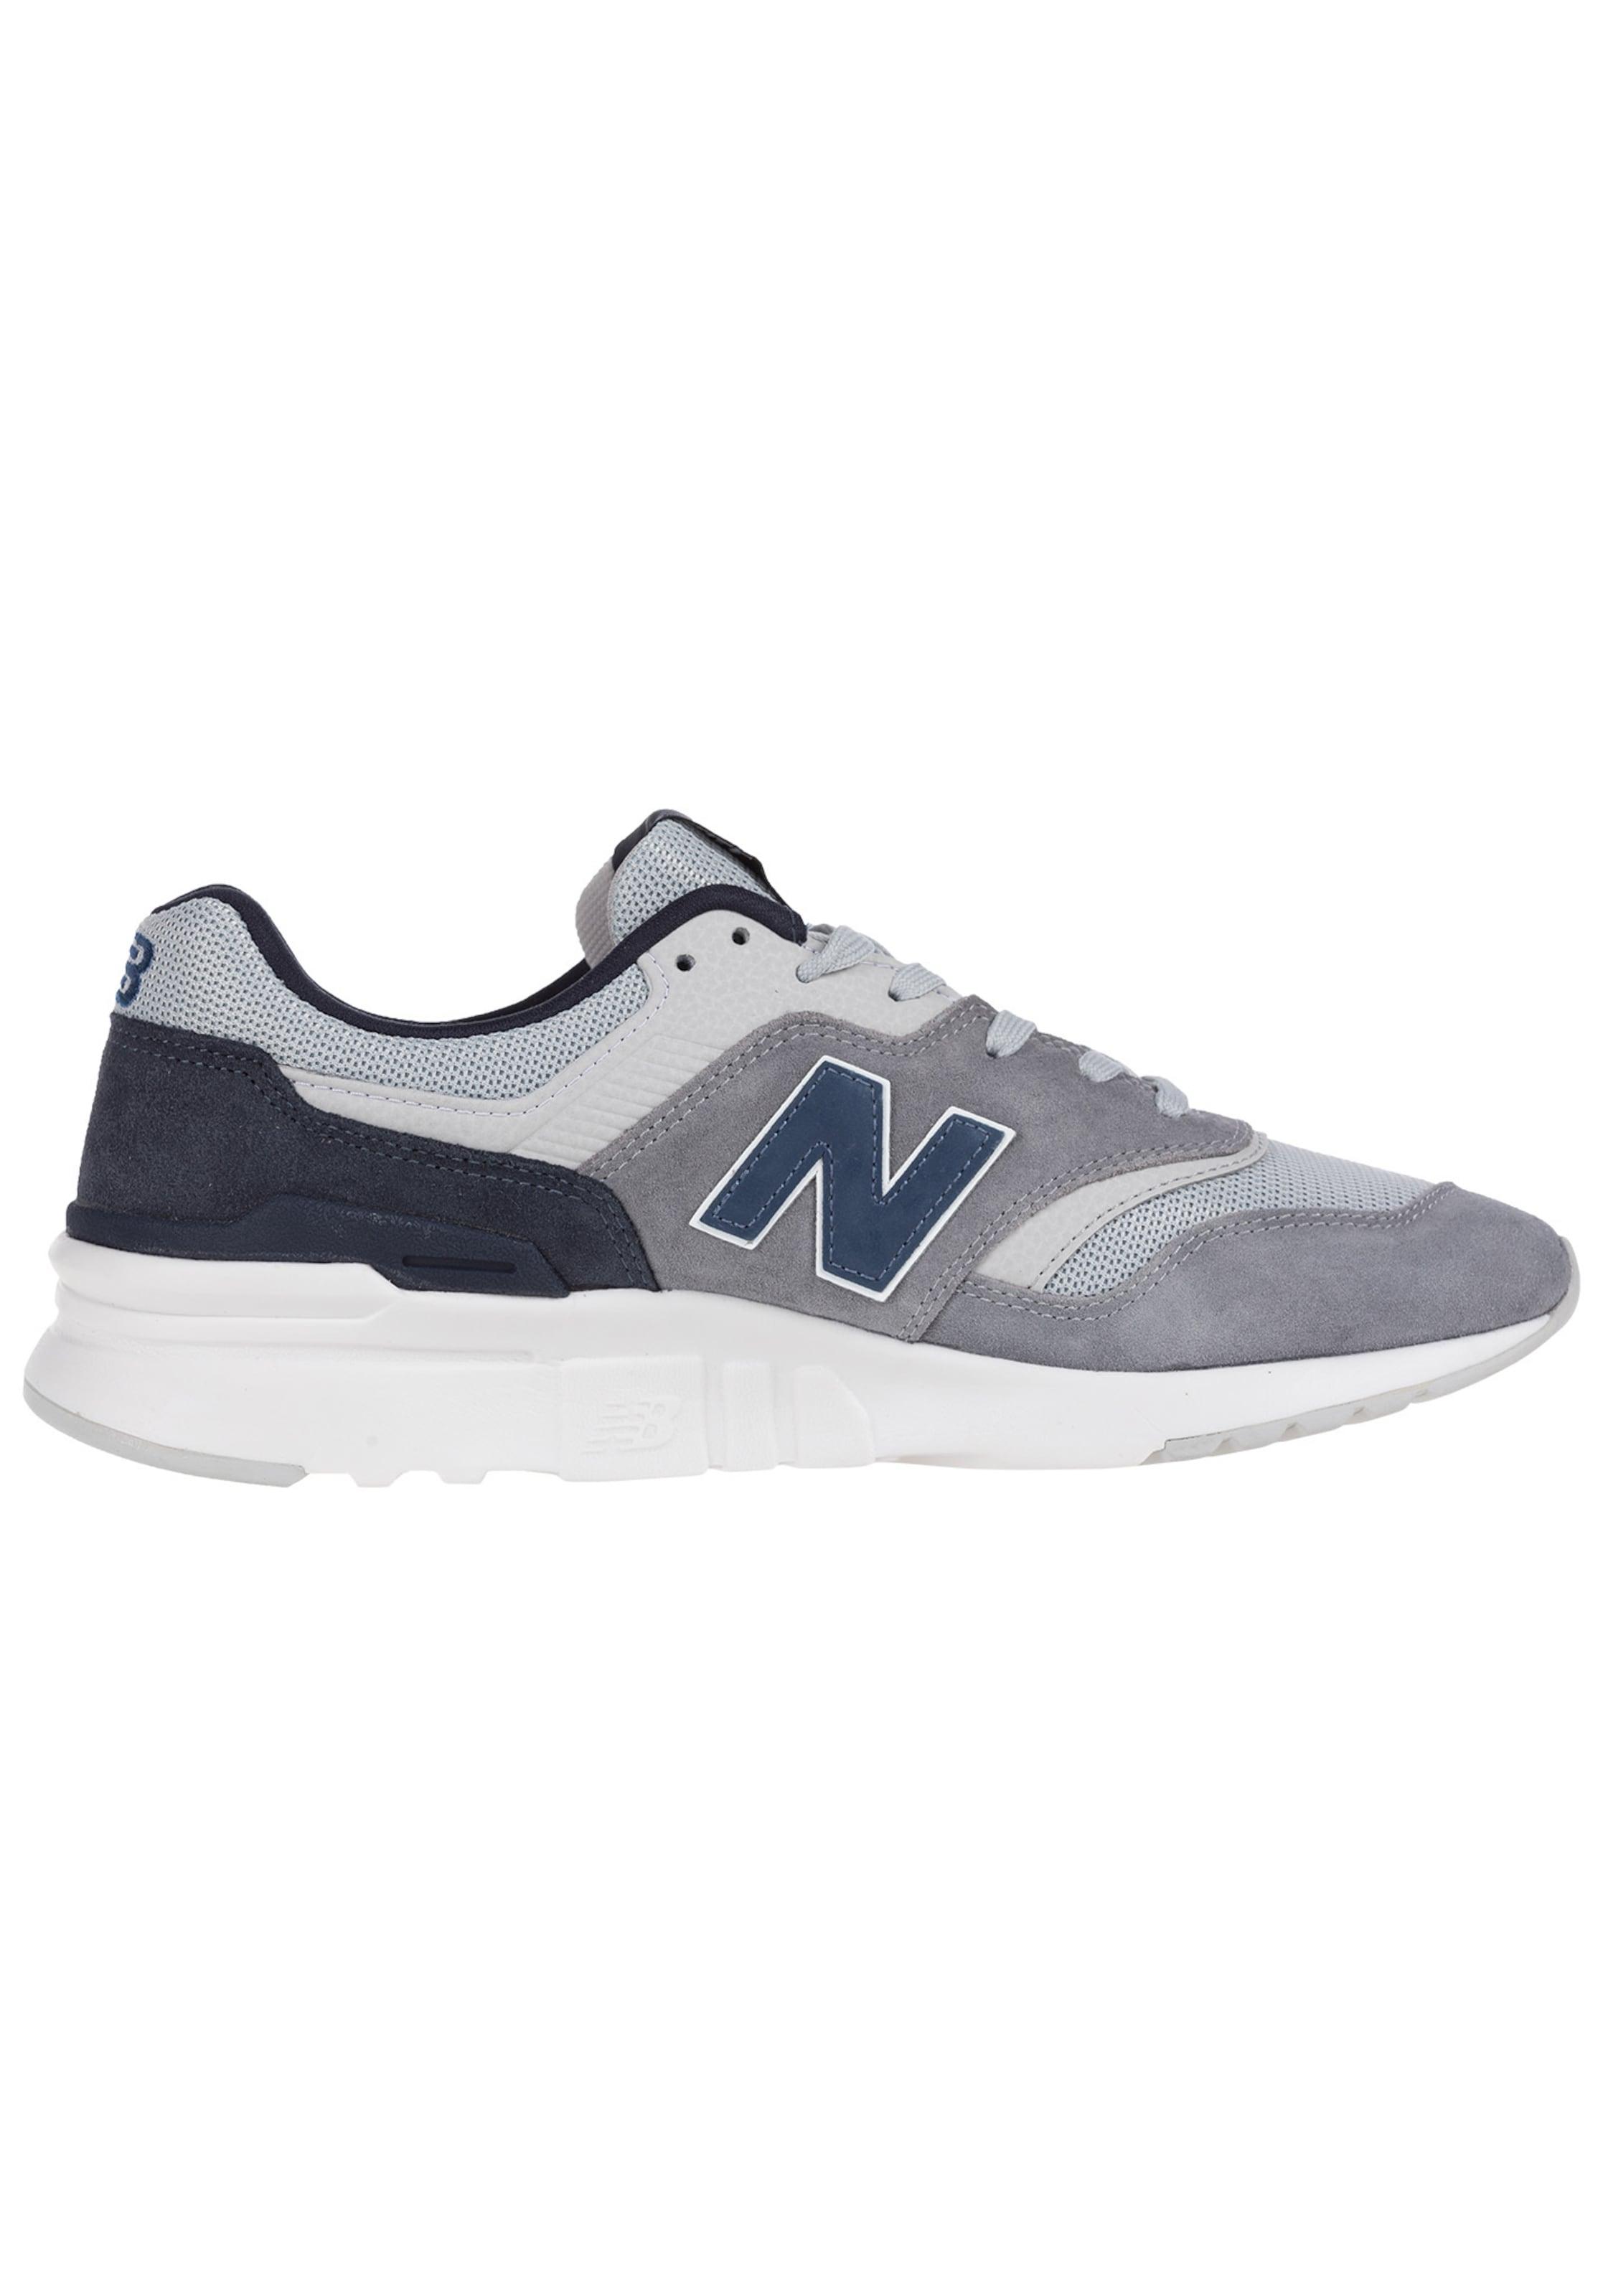 Sneaker In New Dunkelgrau Hellgrau 'cm997' Balance BeigeGrau wPk0On